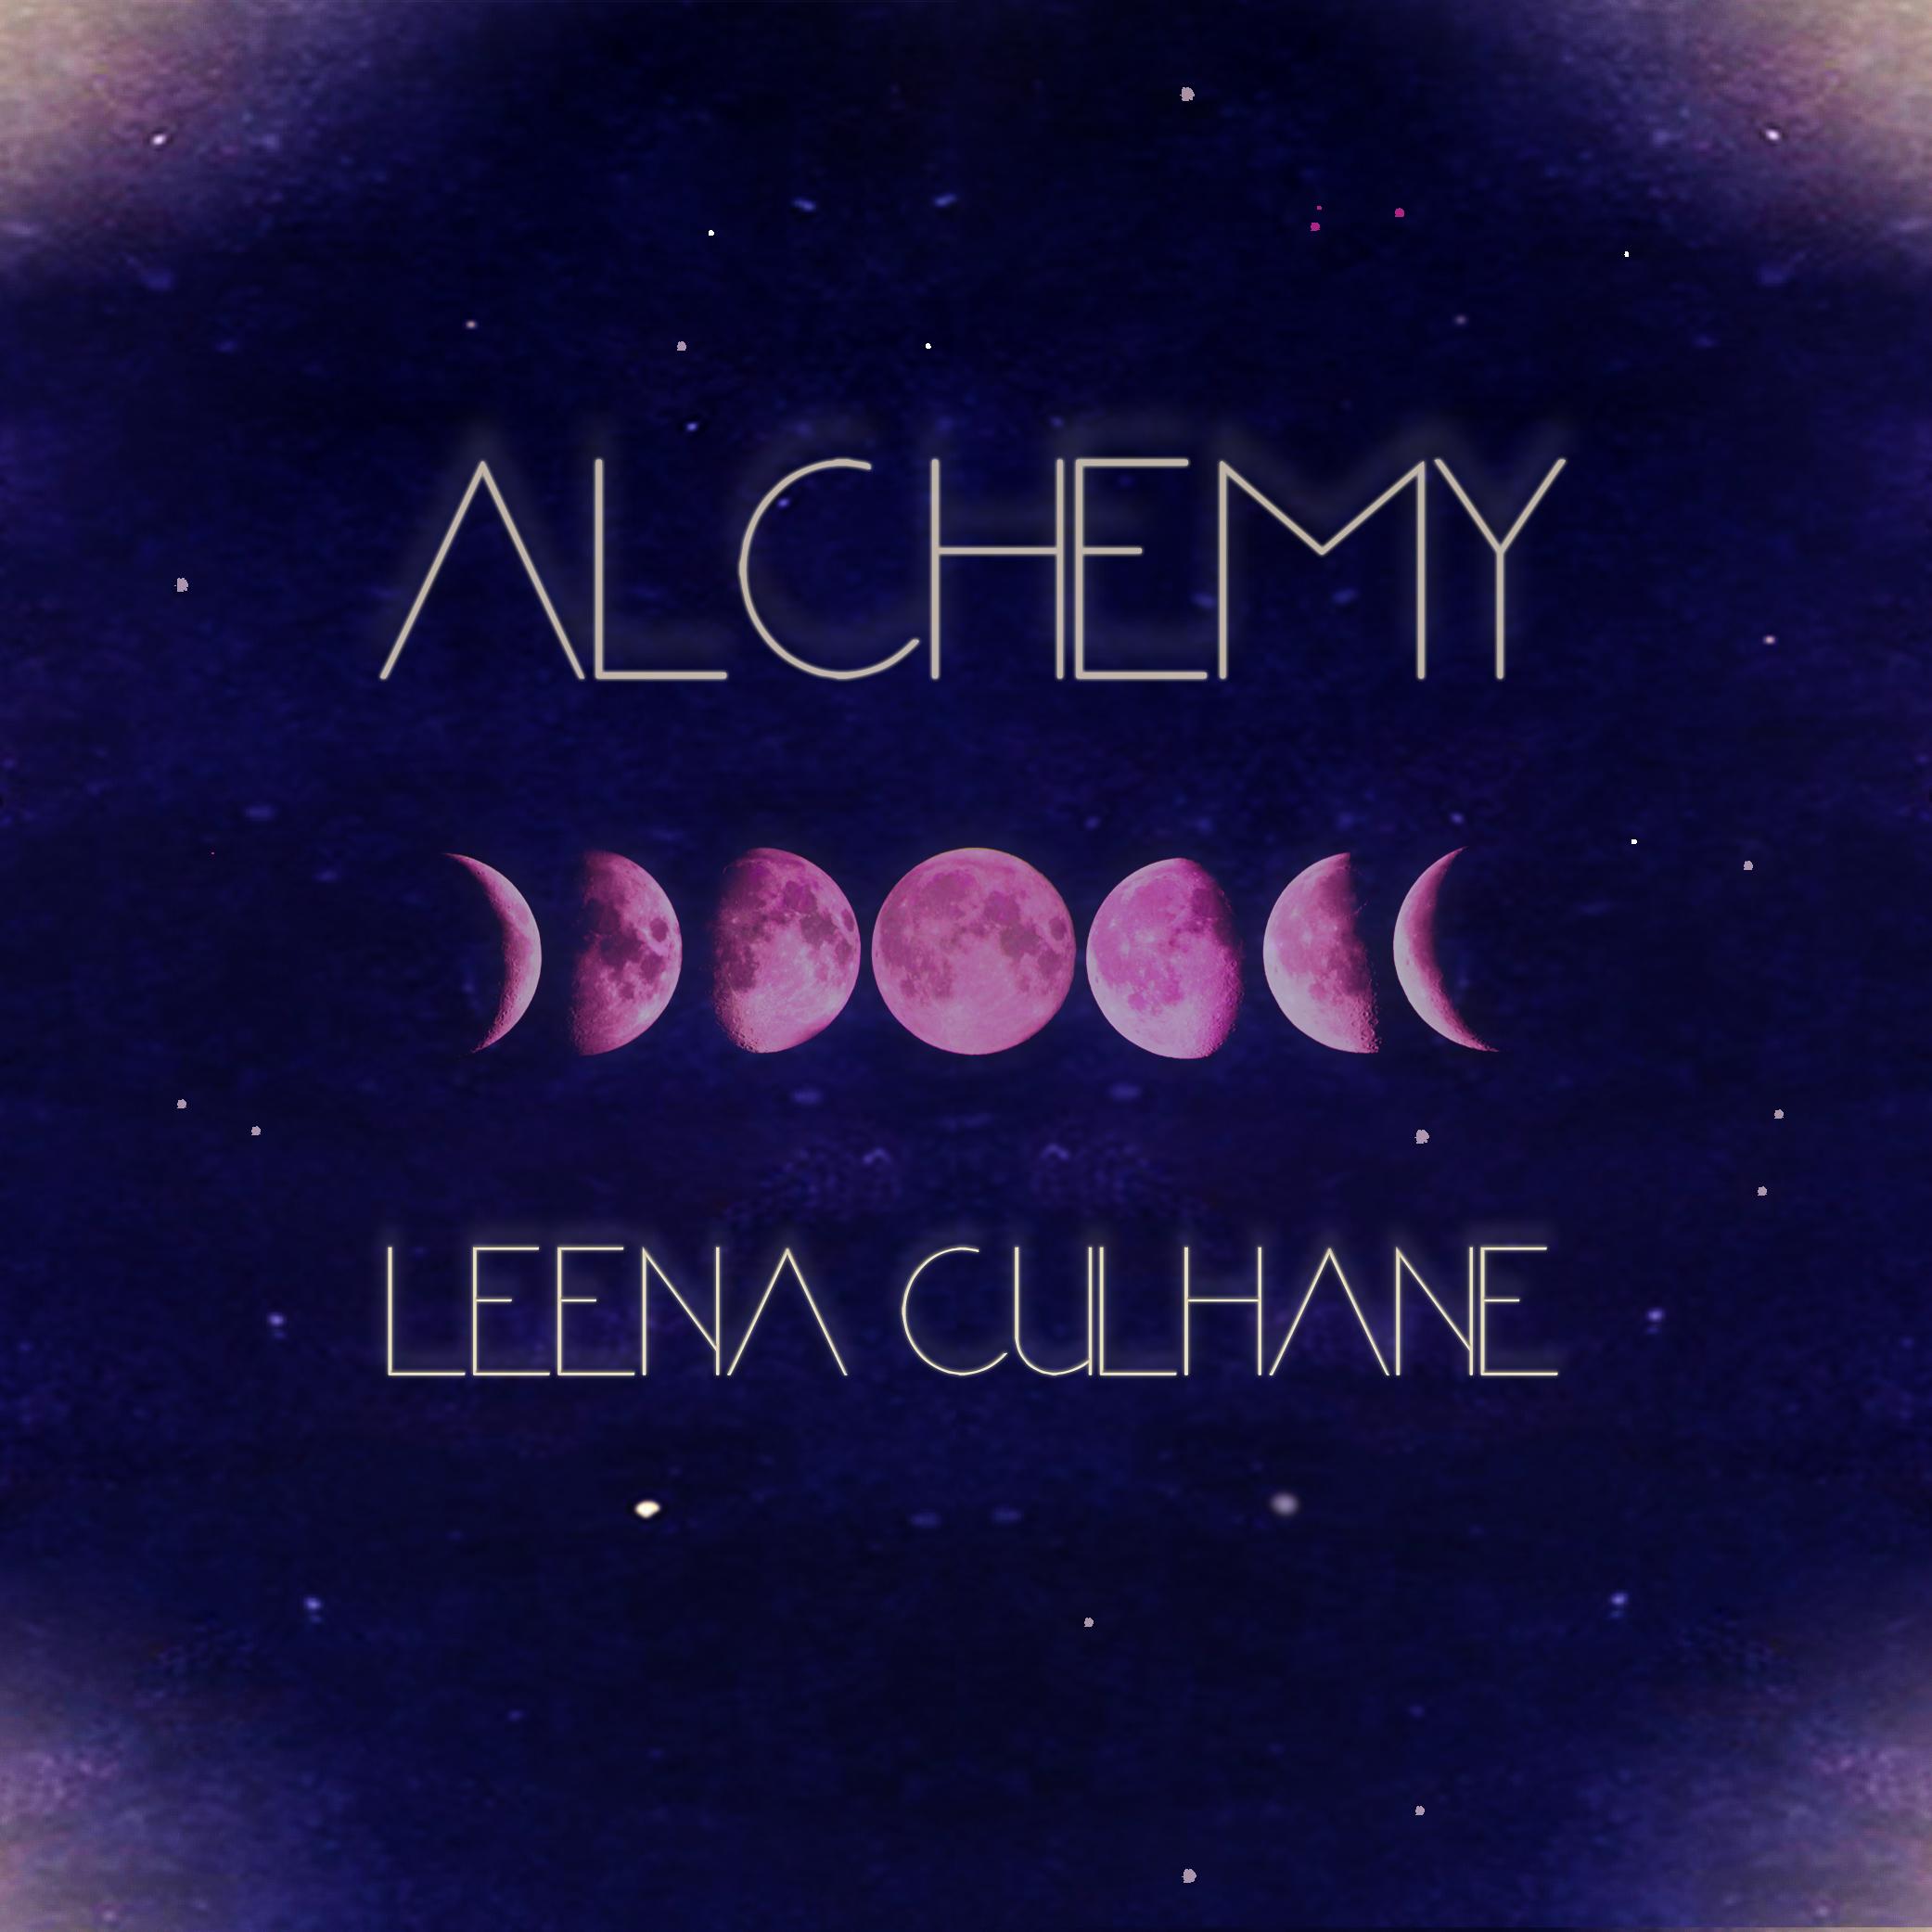 Single artwork by Leena Culhane